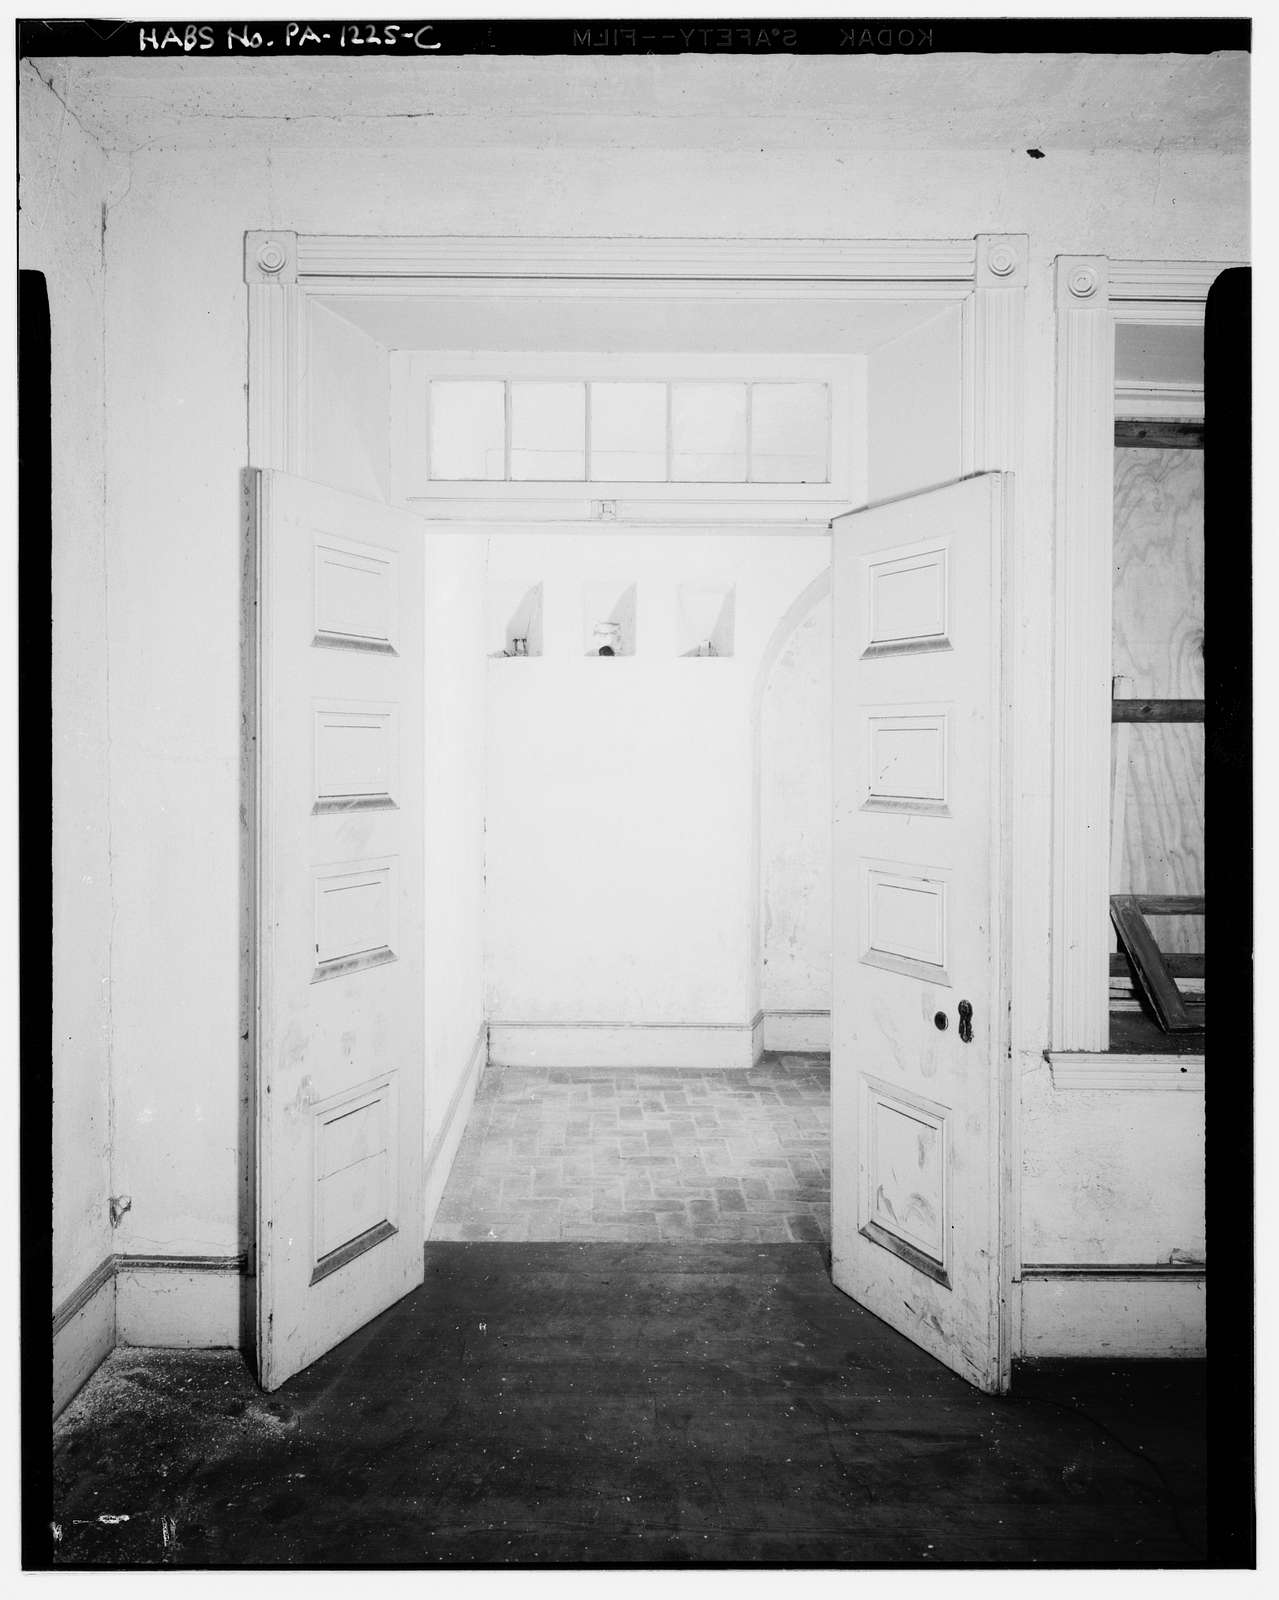 Fort Mifflin, Commandant's House (Headquarters), Mud Island, Marine & Penrose Ferry Roads, Philadelphia, Philadelphia County, PA